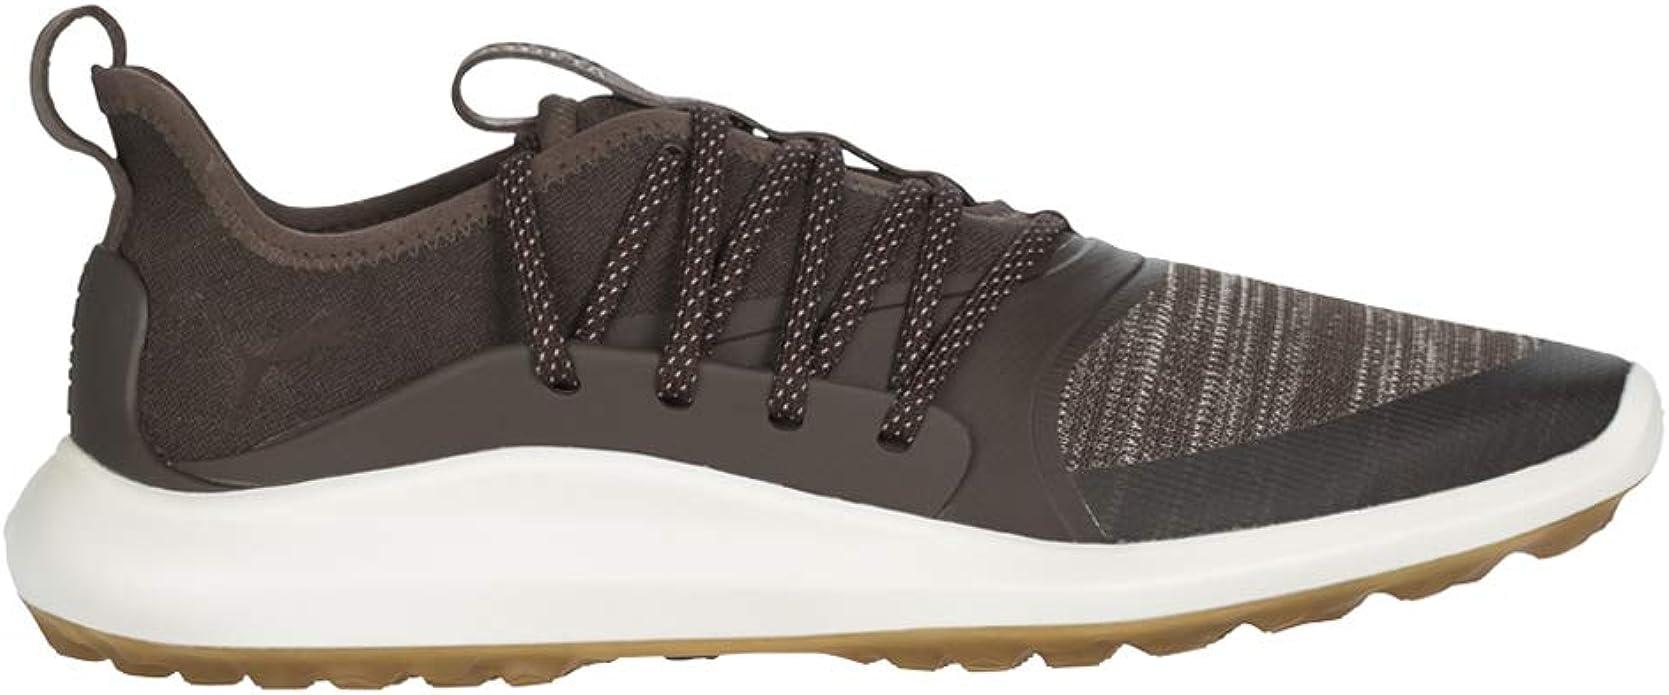 Amazon Com Puma Men S Ignite Nxt Solelace Spikeless Golf Shoes Aloha Le Brown Golf